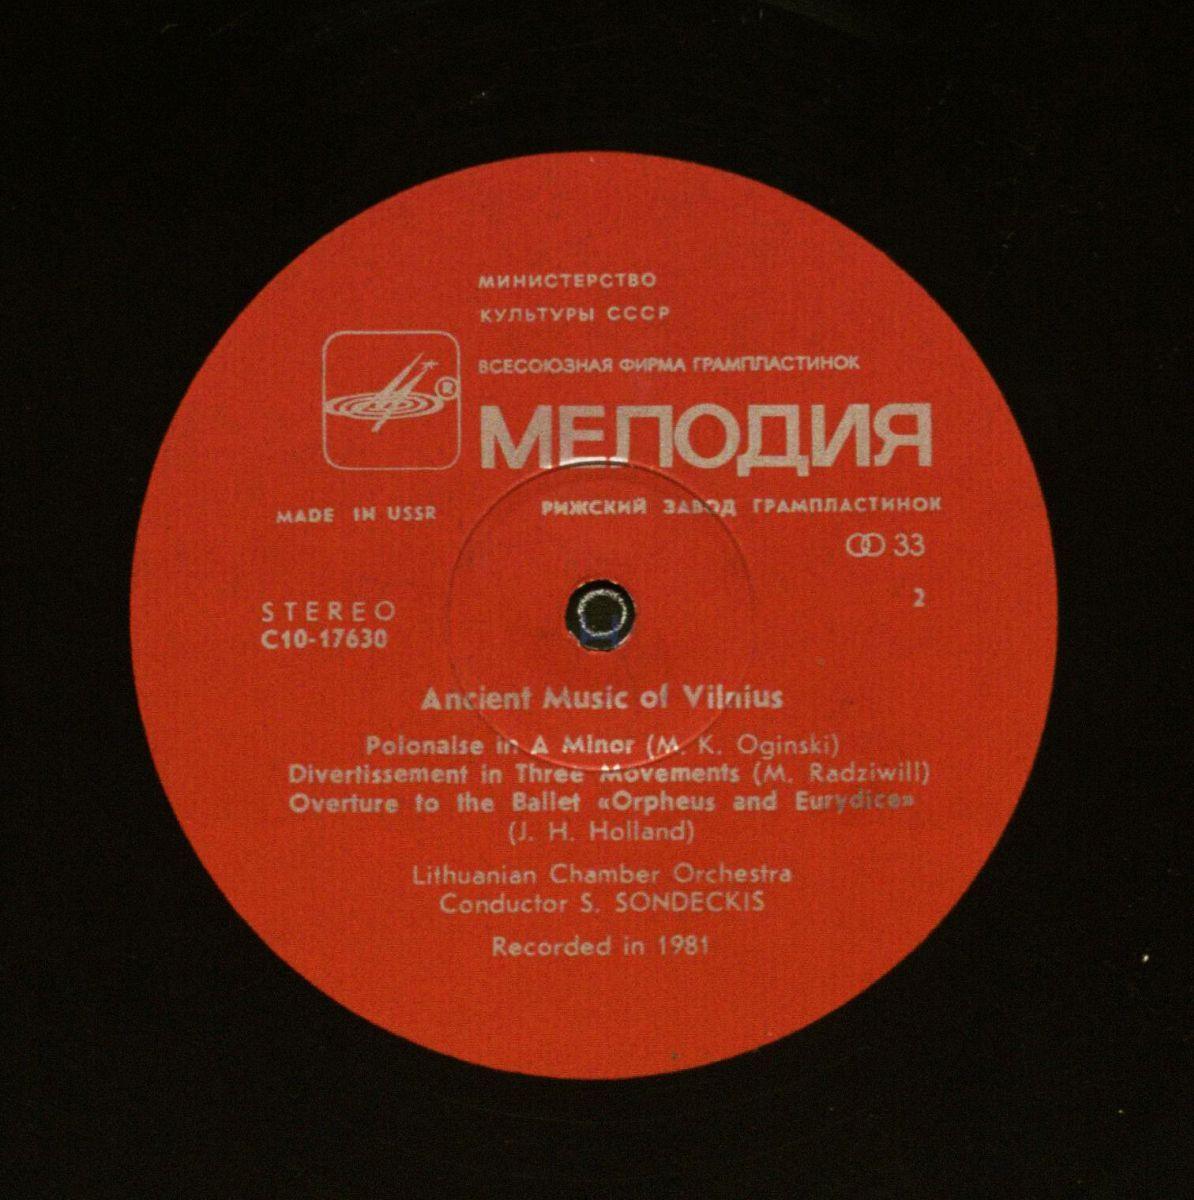 Senoji Vilniaus muzika: Garso įrašas. Vilnius, 1985.